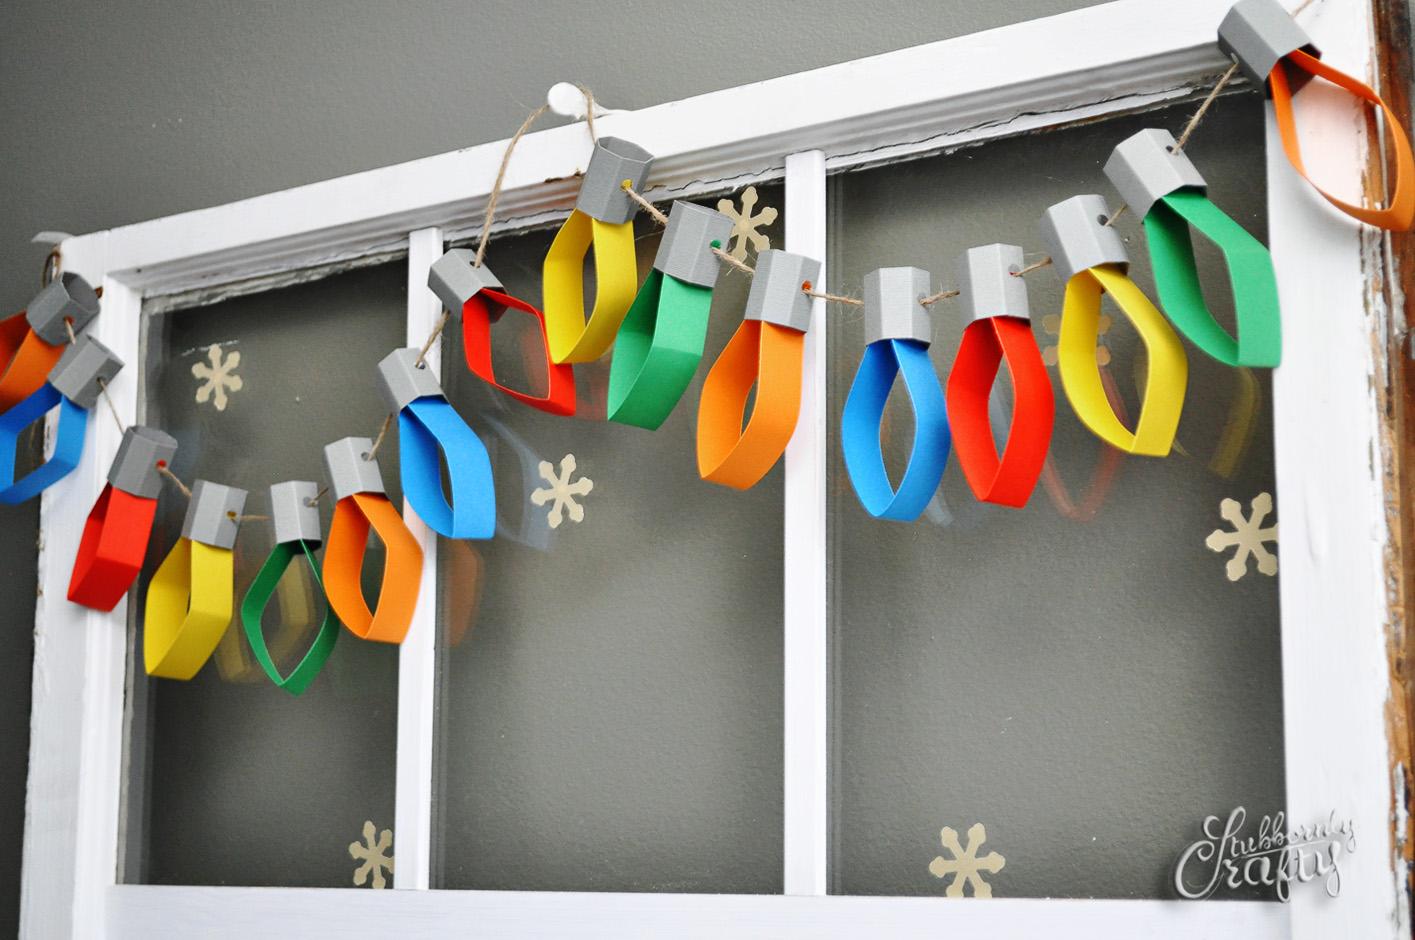 paper garlands in Christmas DIY decorations for kids bedrooms | lovelyspaces.com